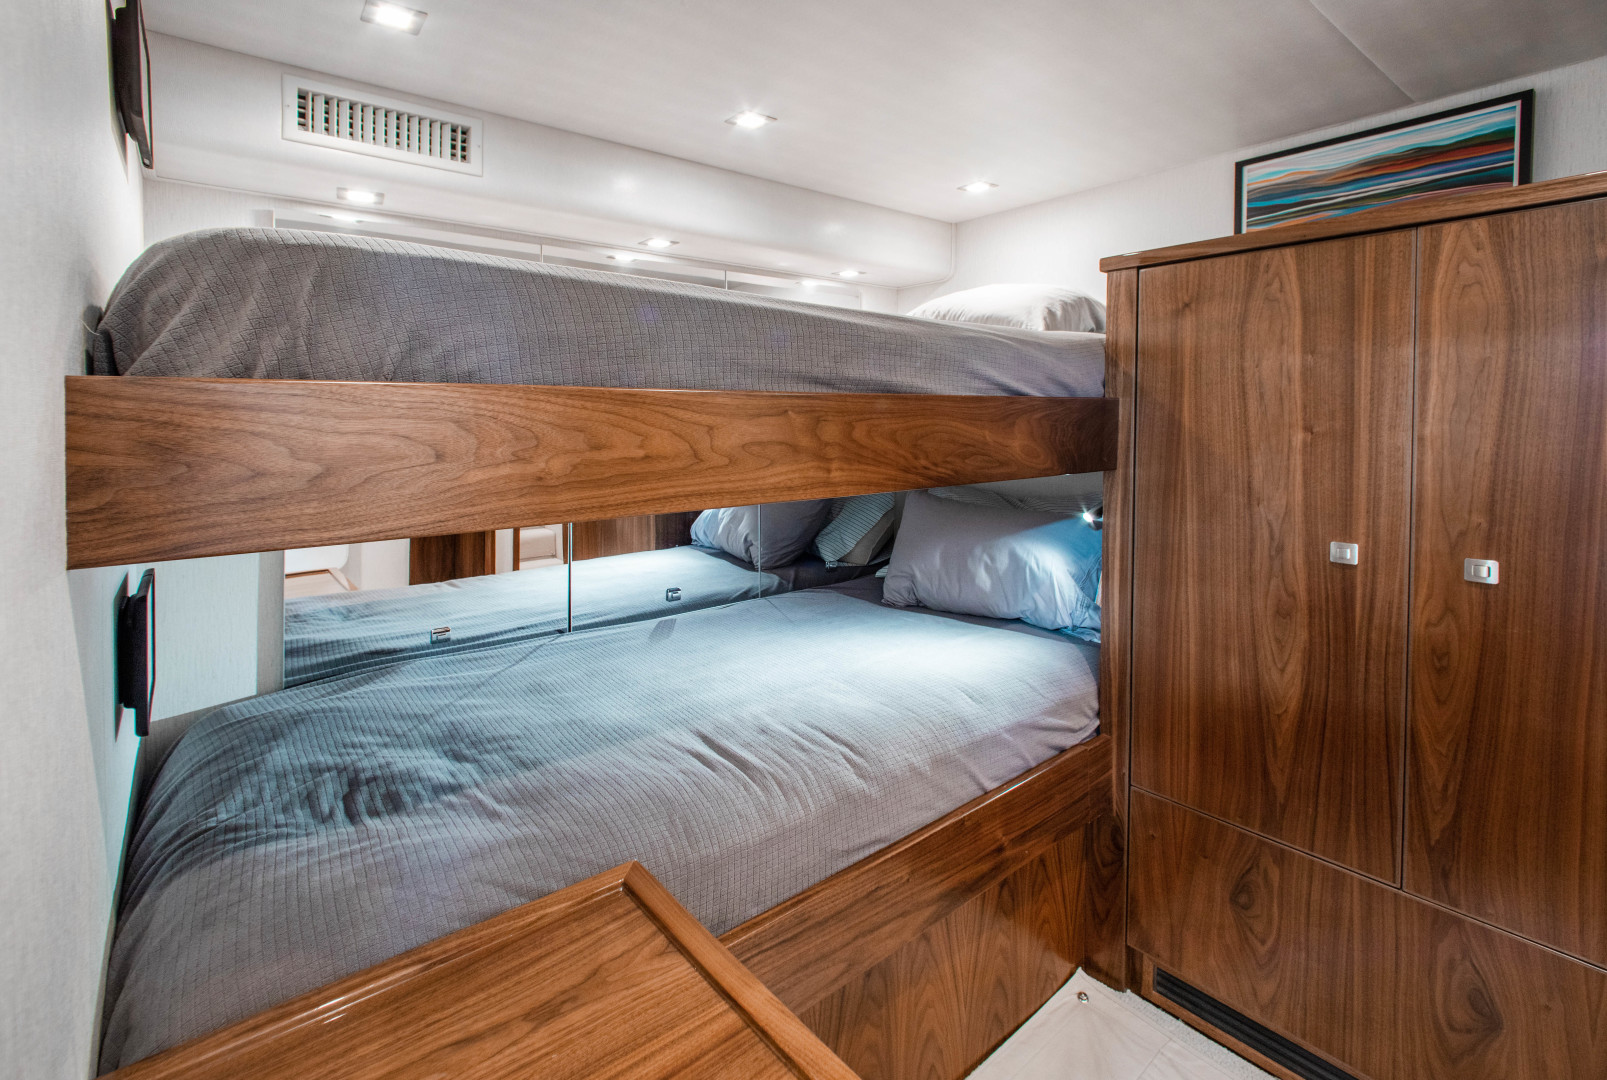 Viking-72 Enclosed Bridge 2018-Red Lion Ocean Reef-Florida-United States-2018 Viking 72 Enclosed Bridge  Red Lion  Guest Stateroom-1568223   Thumbnail